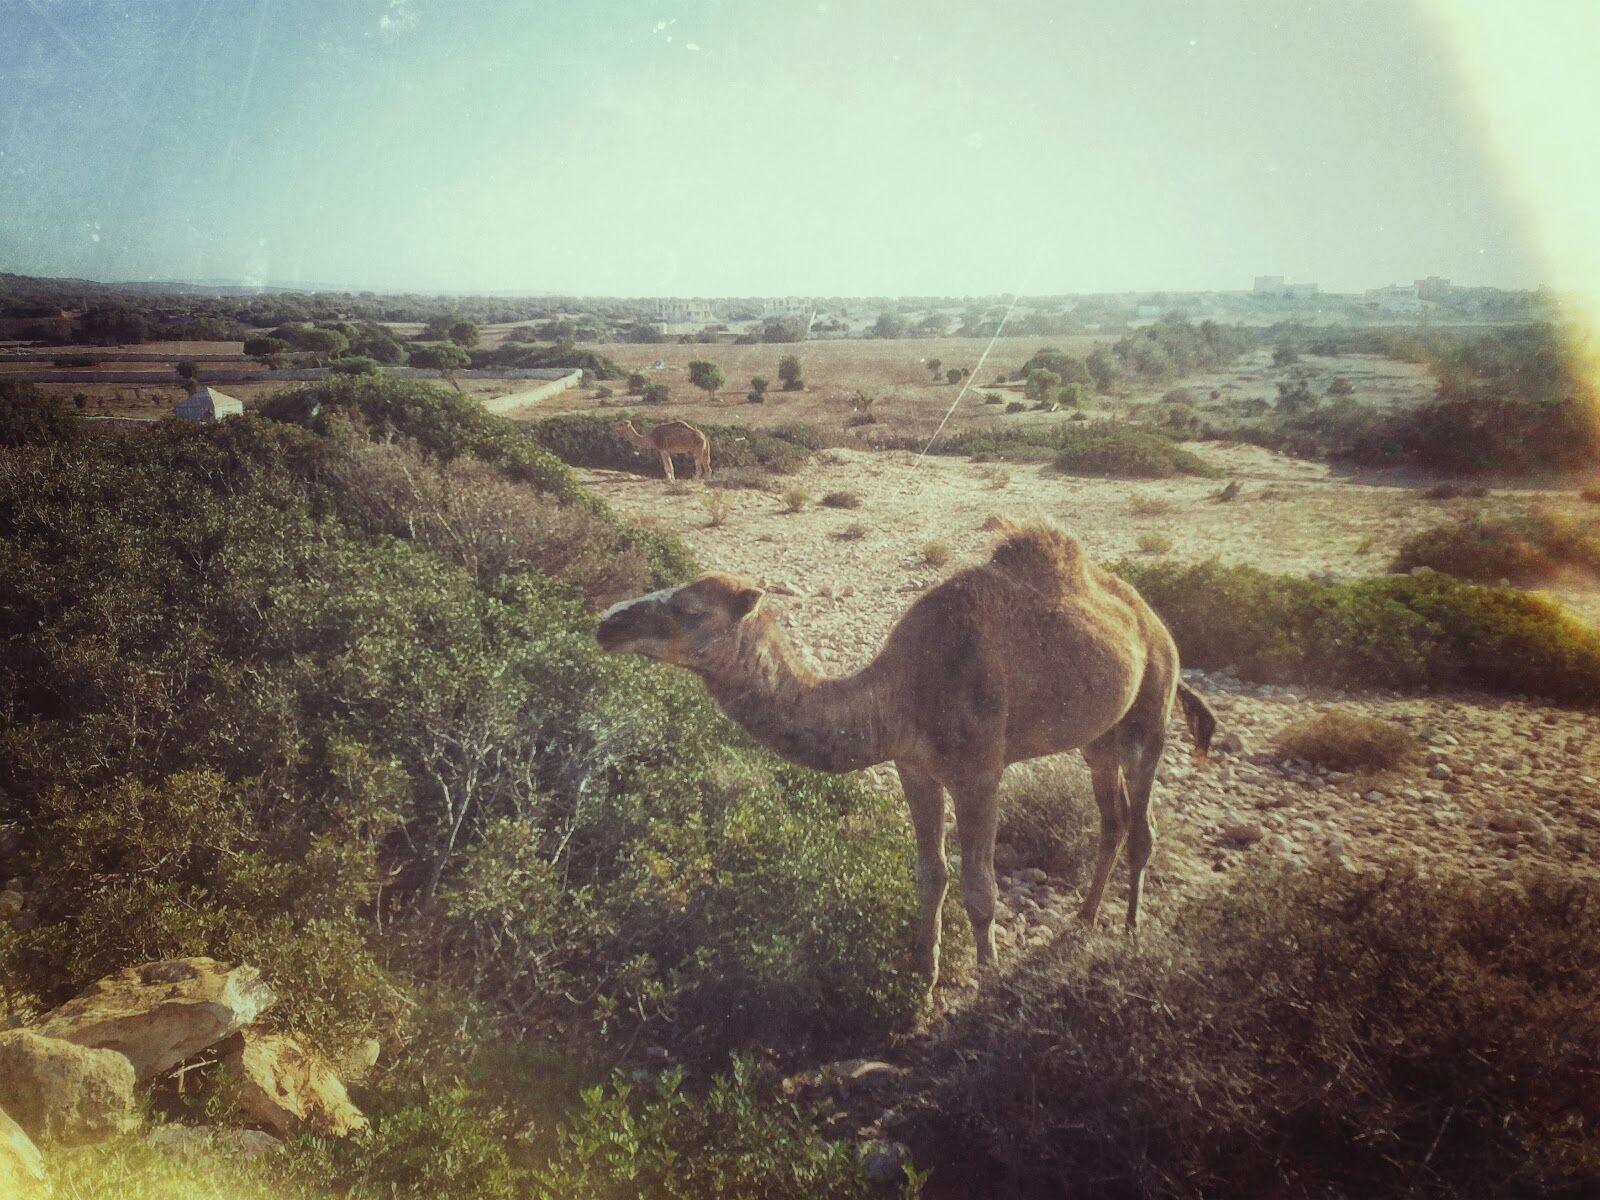 Верблюды возле Атлантики, Марокко